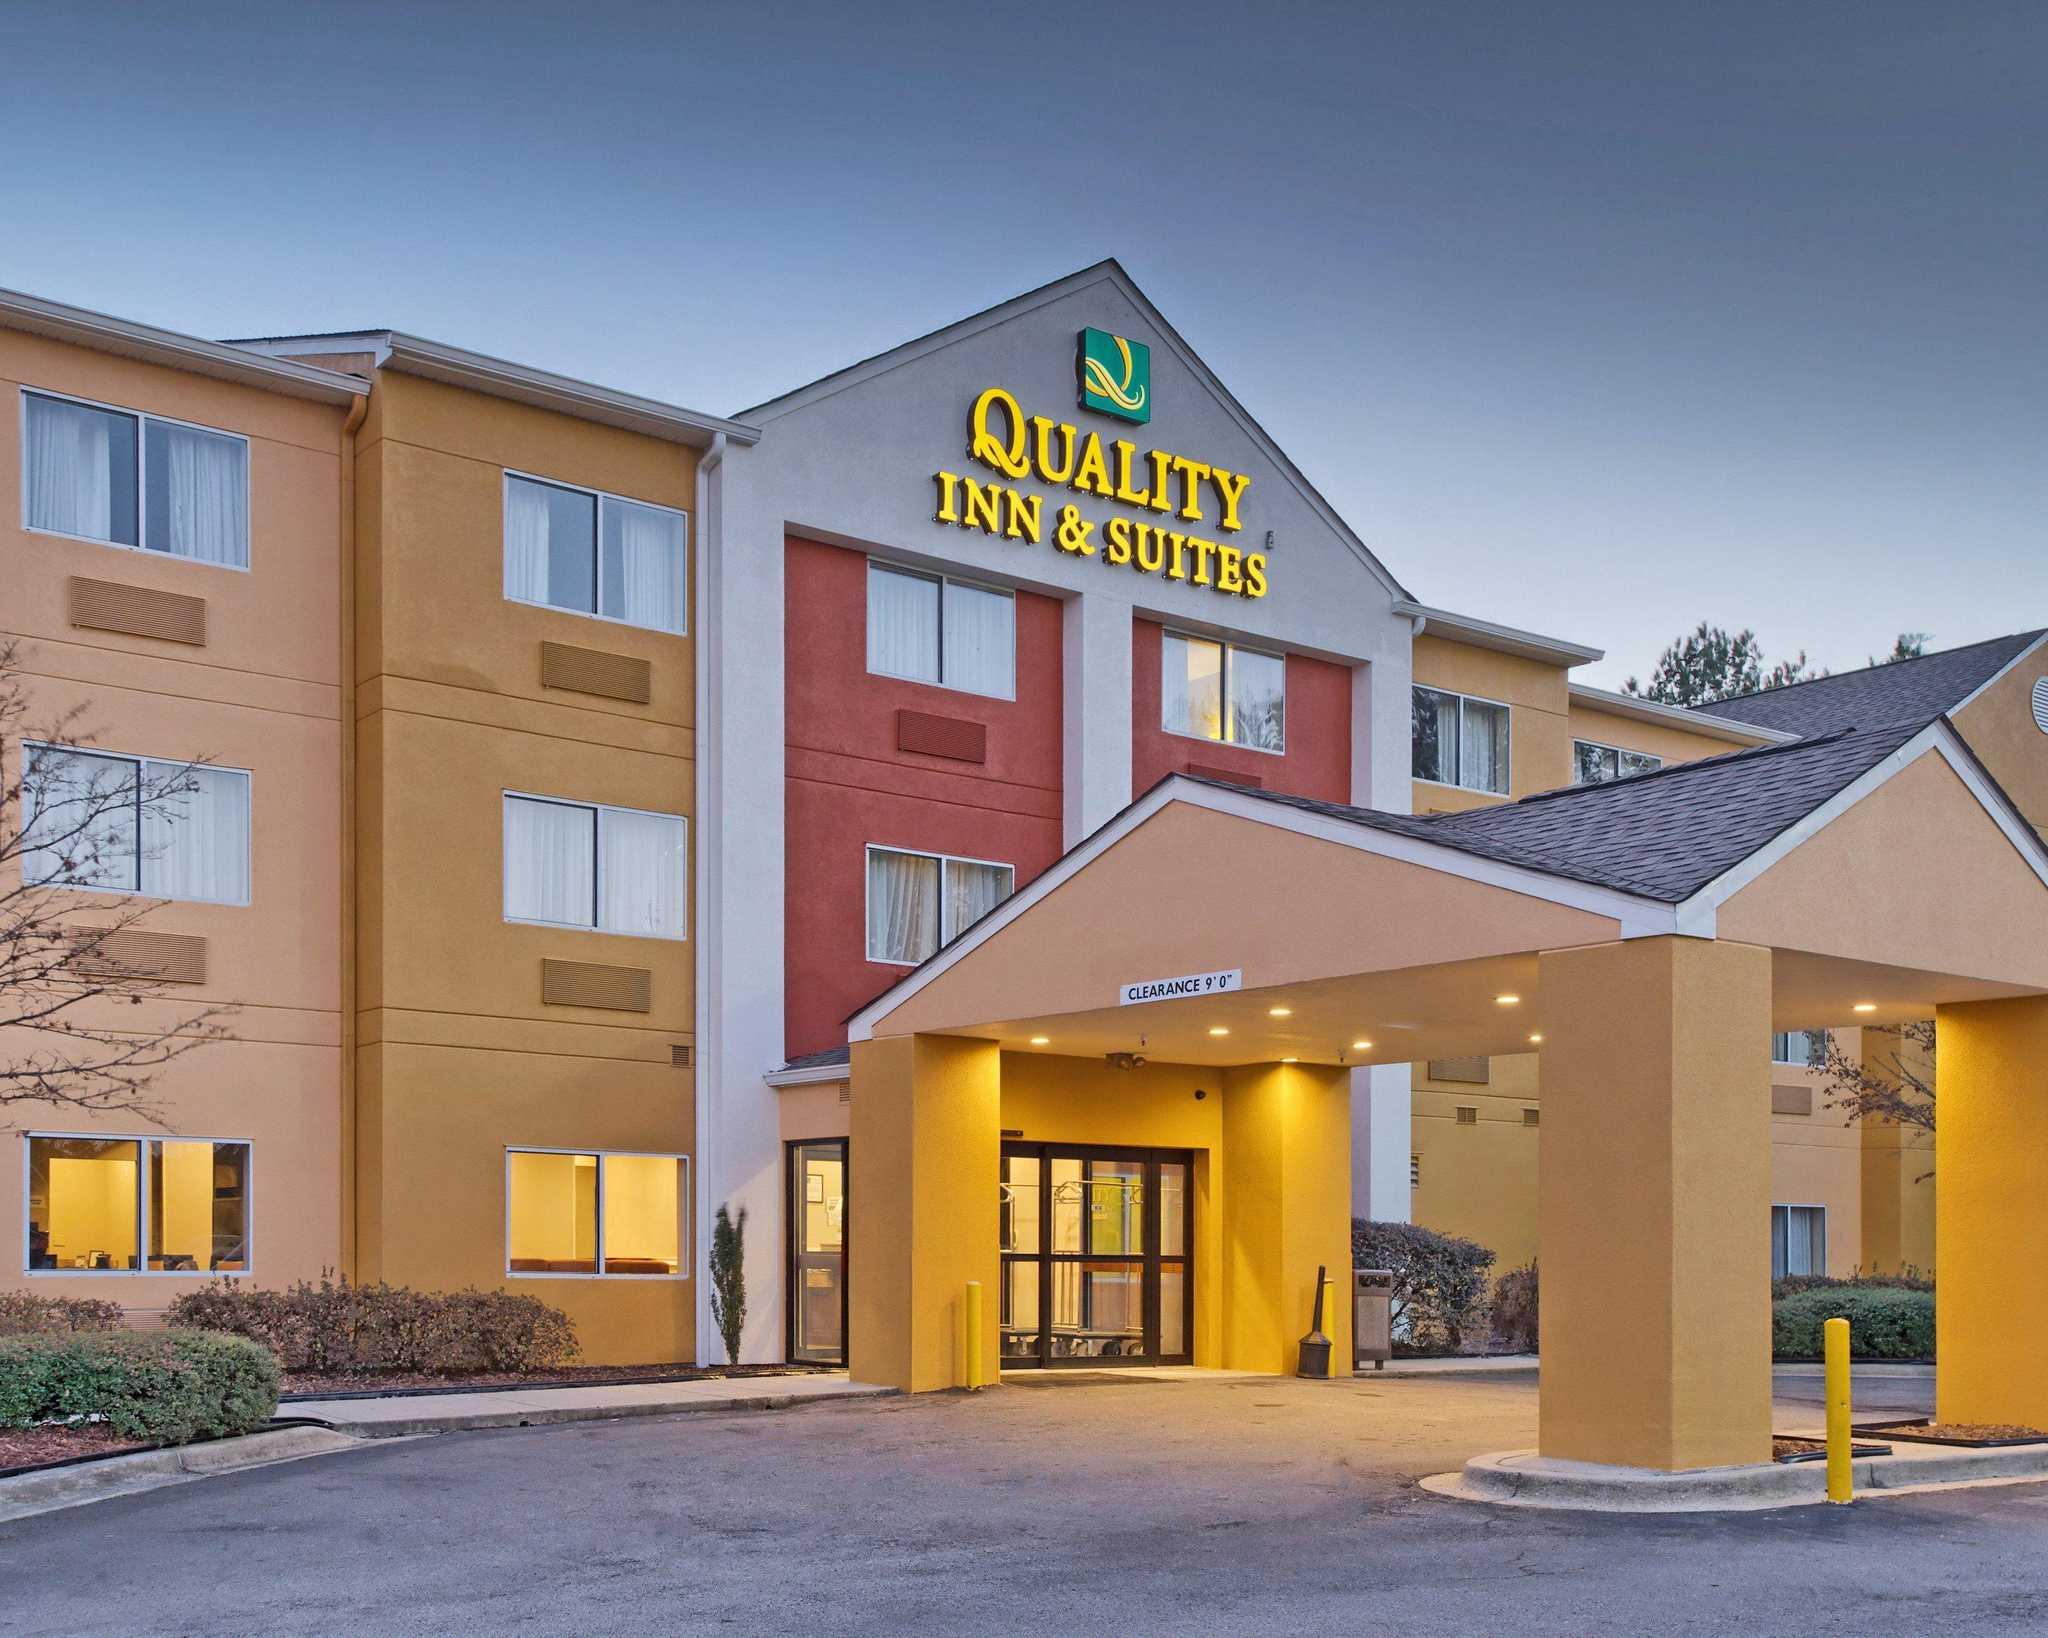 Hotels Near Birmingham Zoo With Indoor Pool